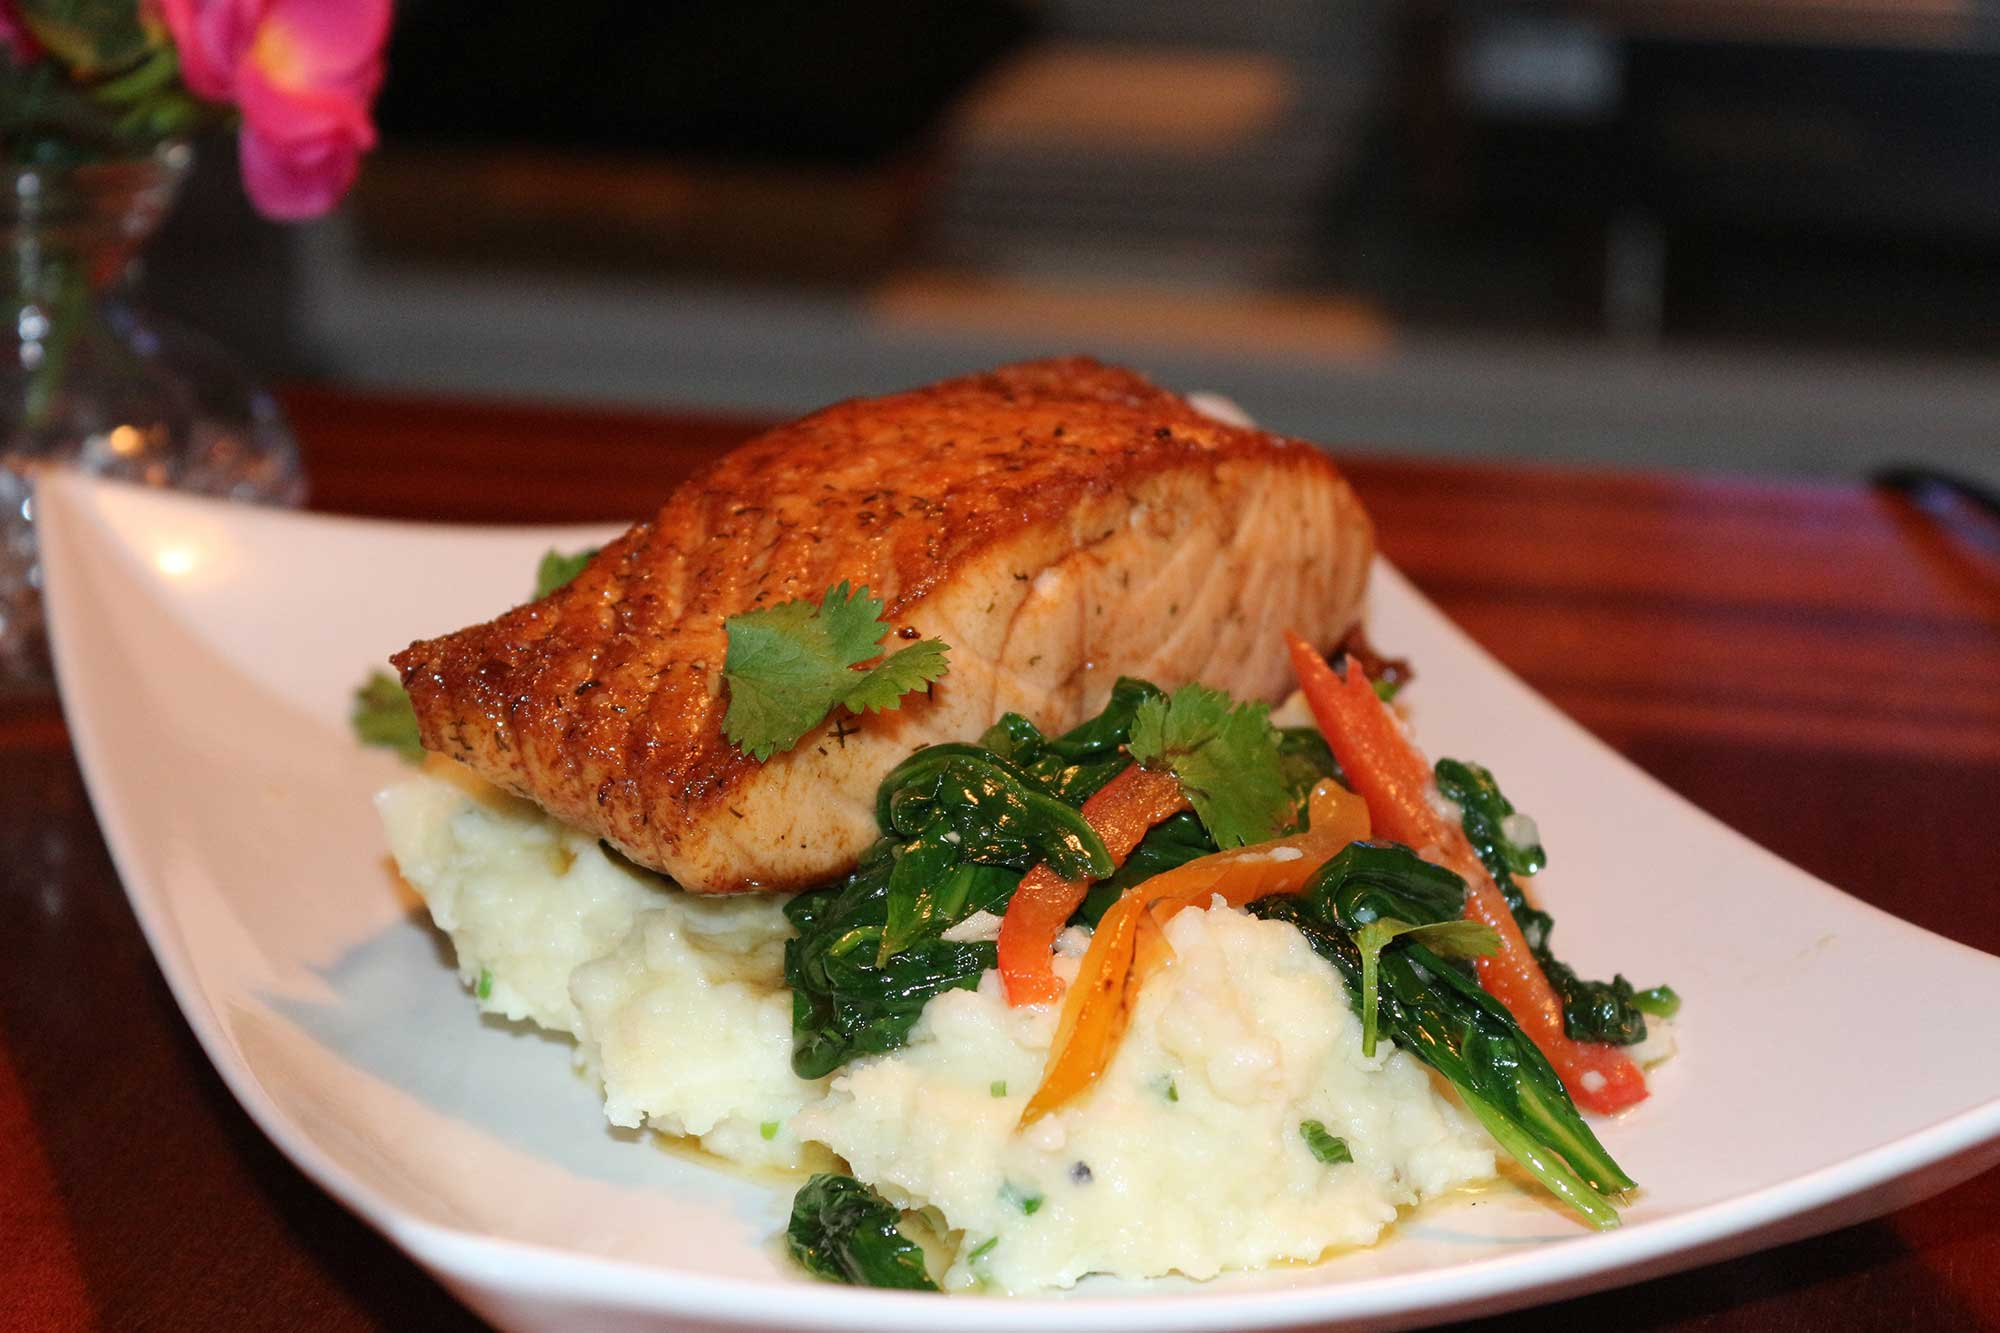 Salmon and mashed potatoes